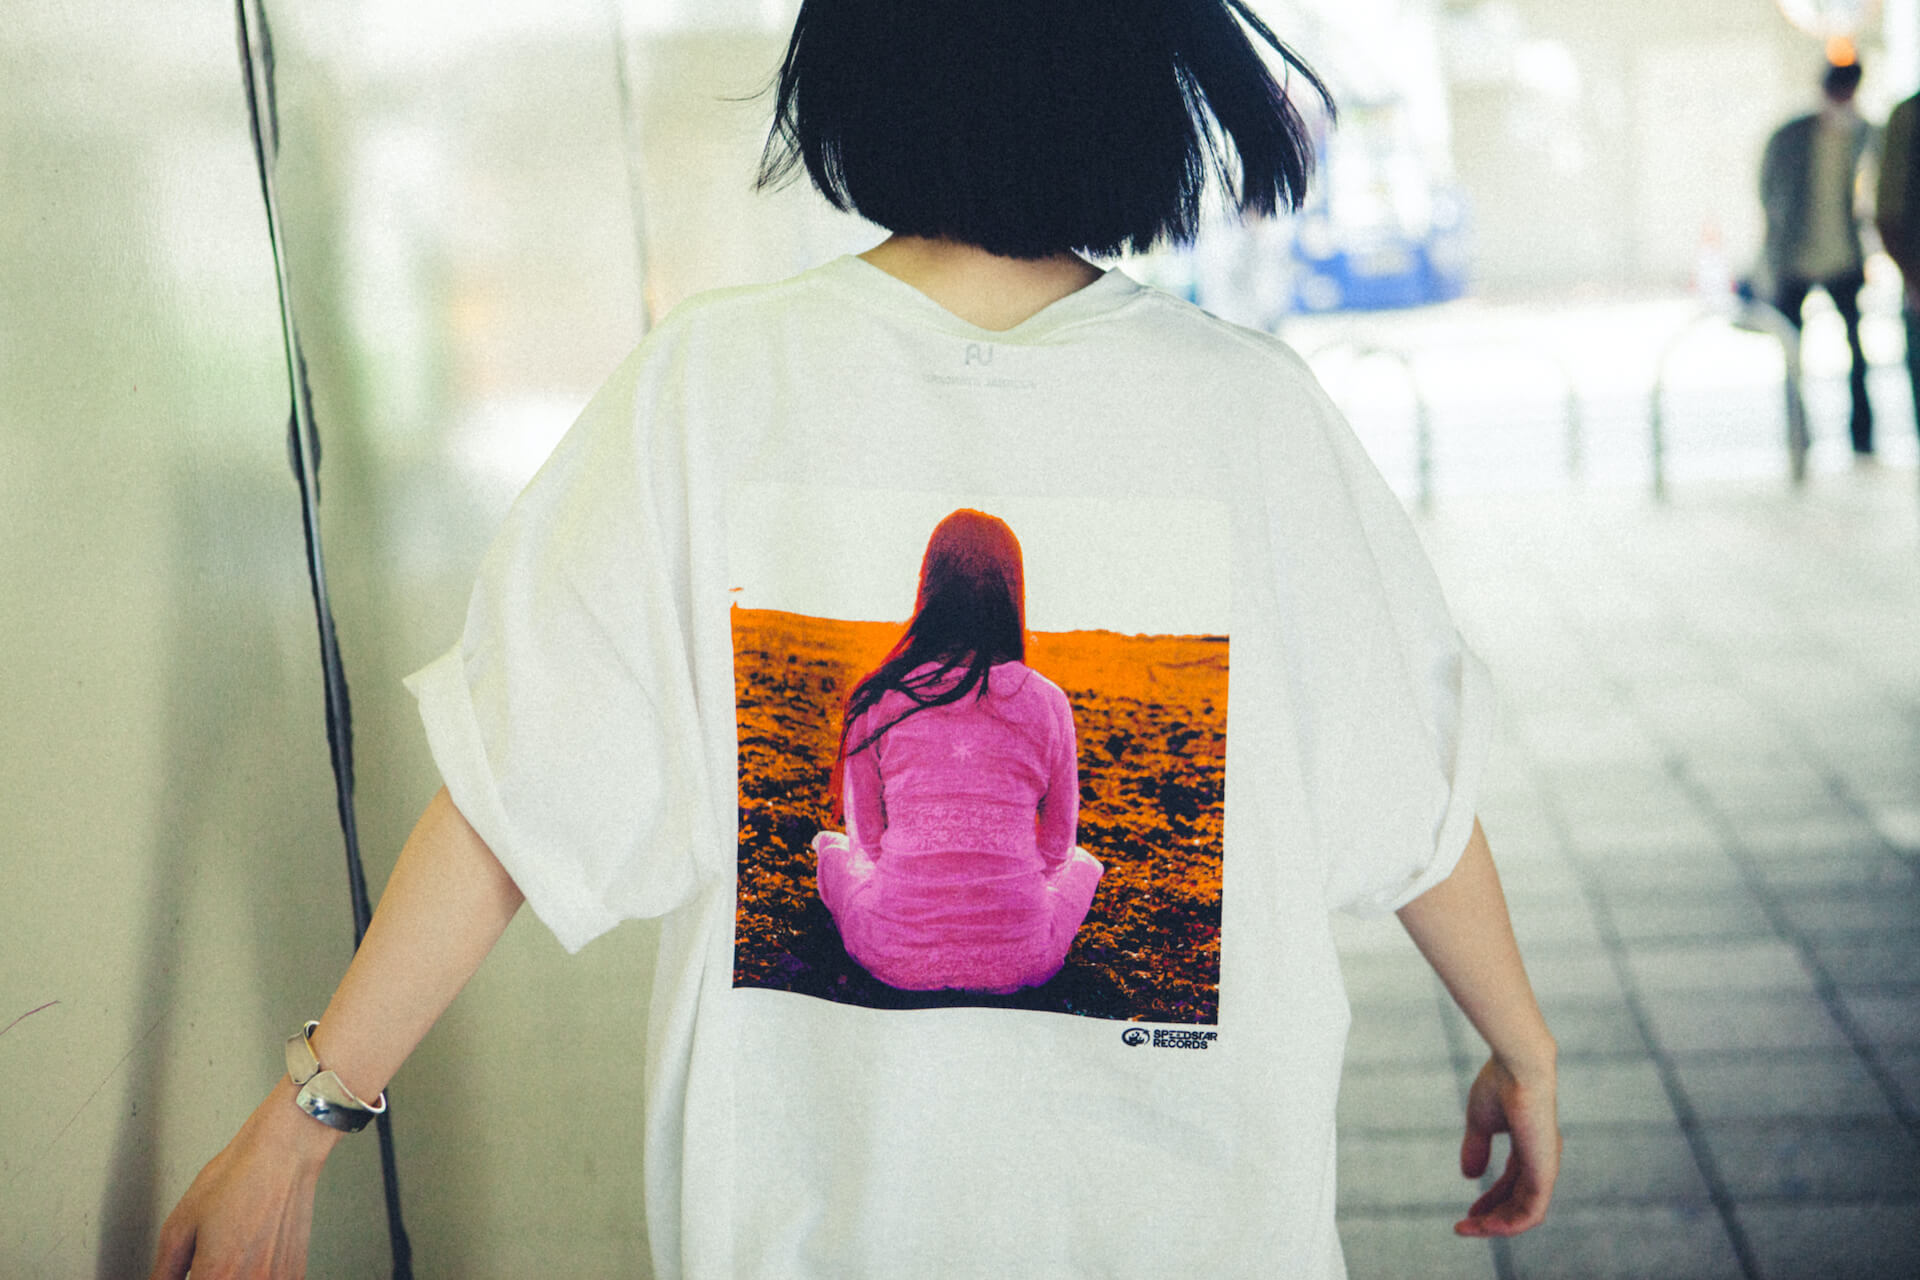 UA × Journal StandardのコラボTシャツが6月25日より店舗販売開始|美衣がモデルを務めるビジュアルも公開に life_fashion210611-ua-journalstandard-7